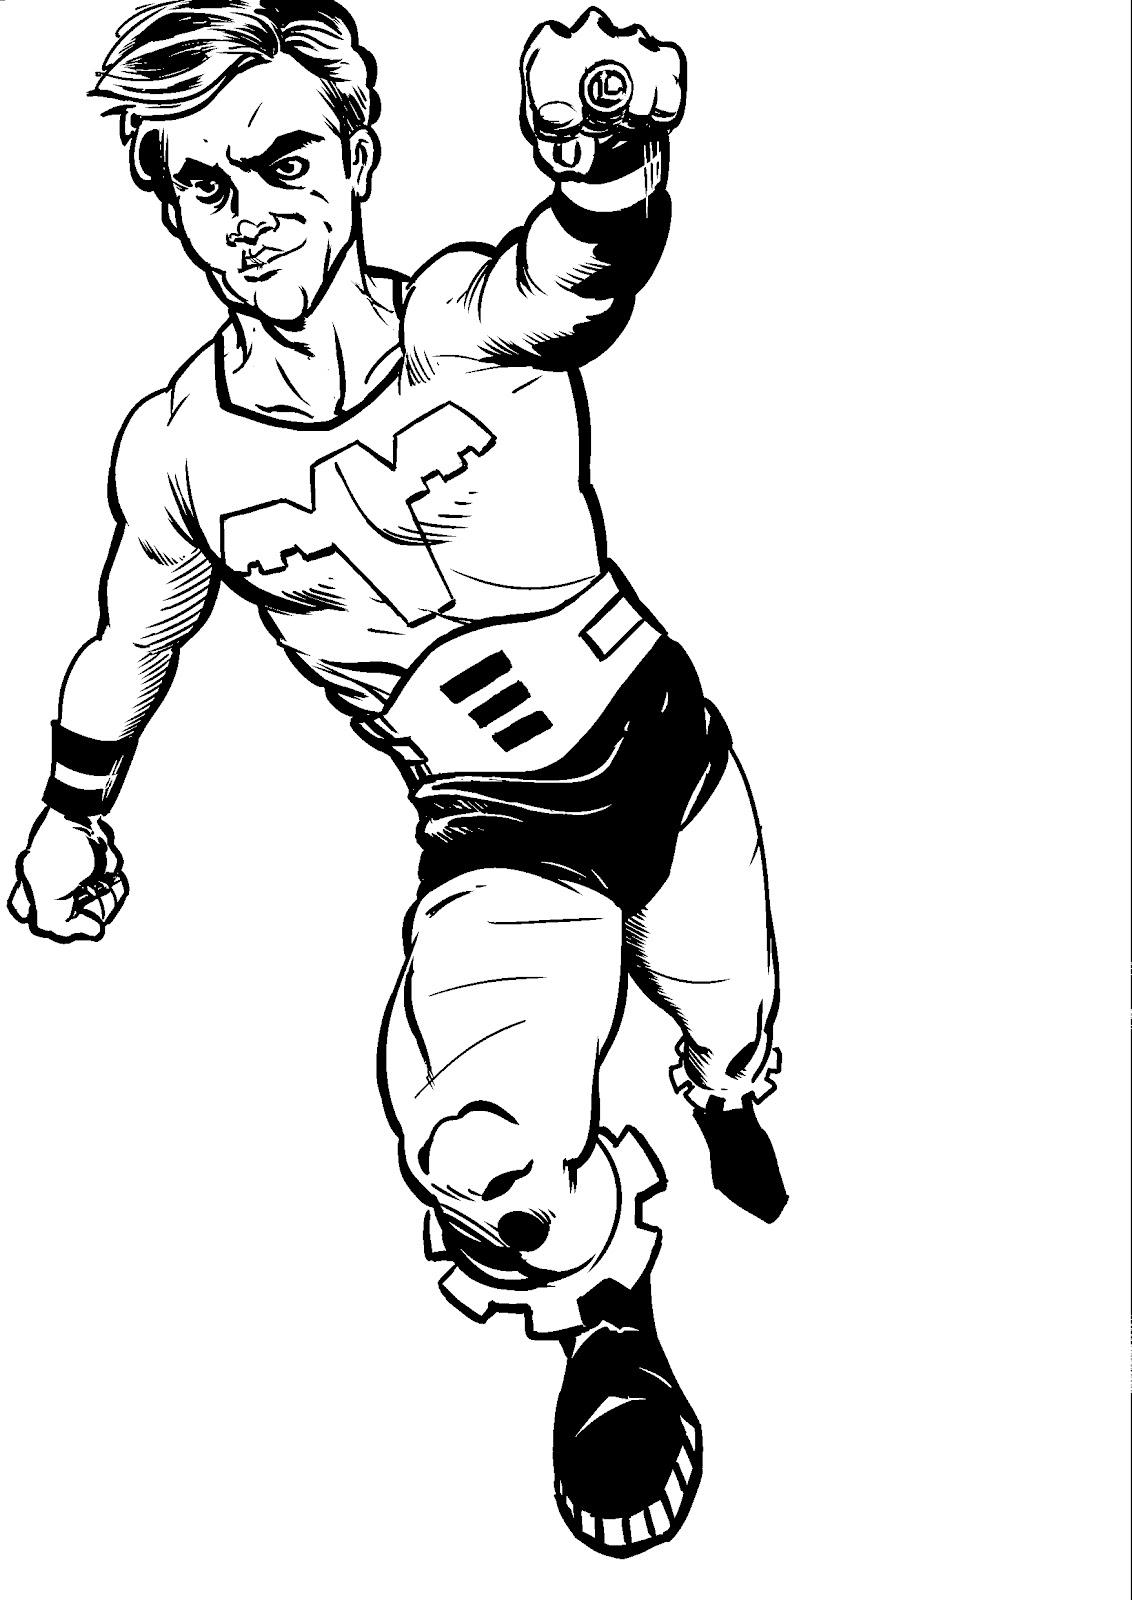 Sharkboy And Lavagirl Drawing at GetDrawings.com | Free ...